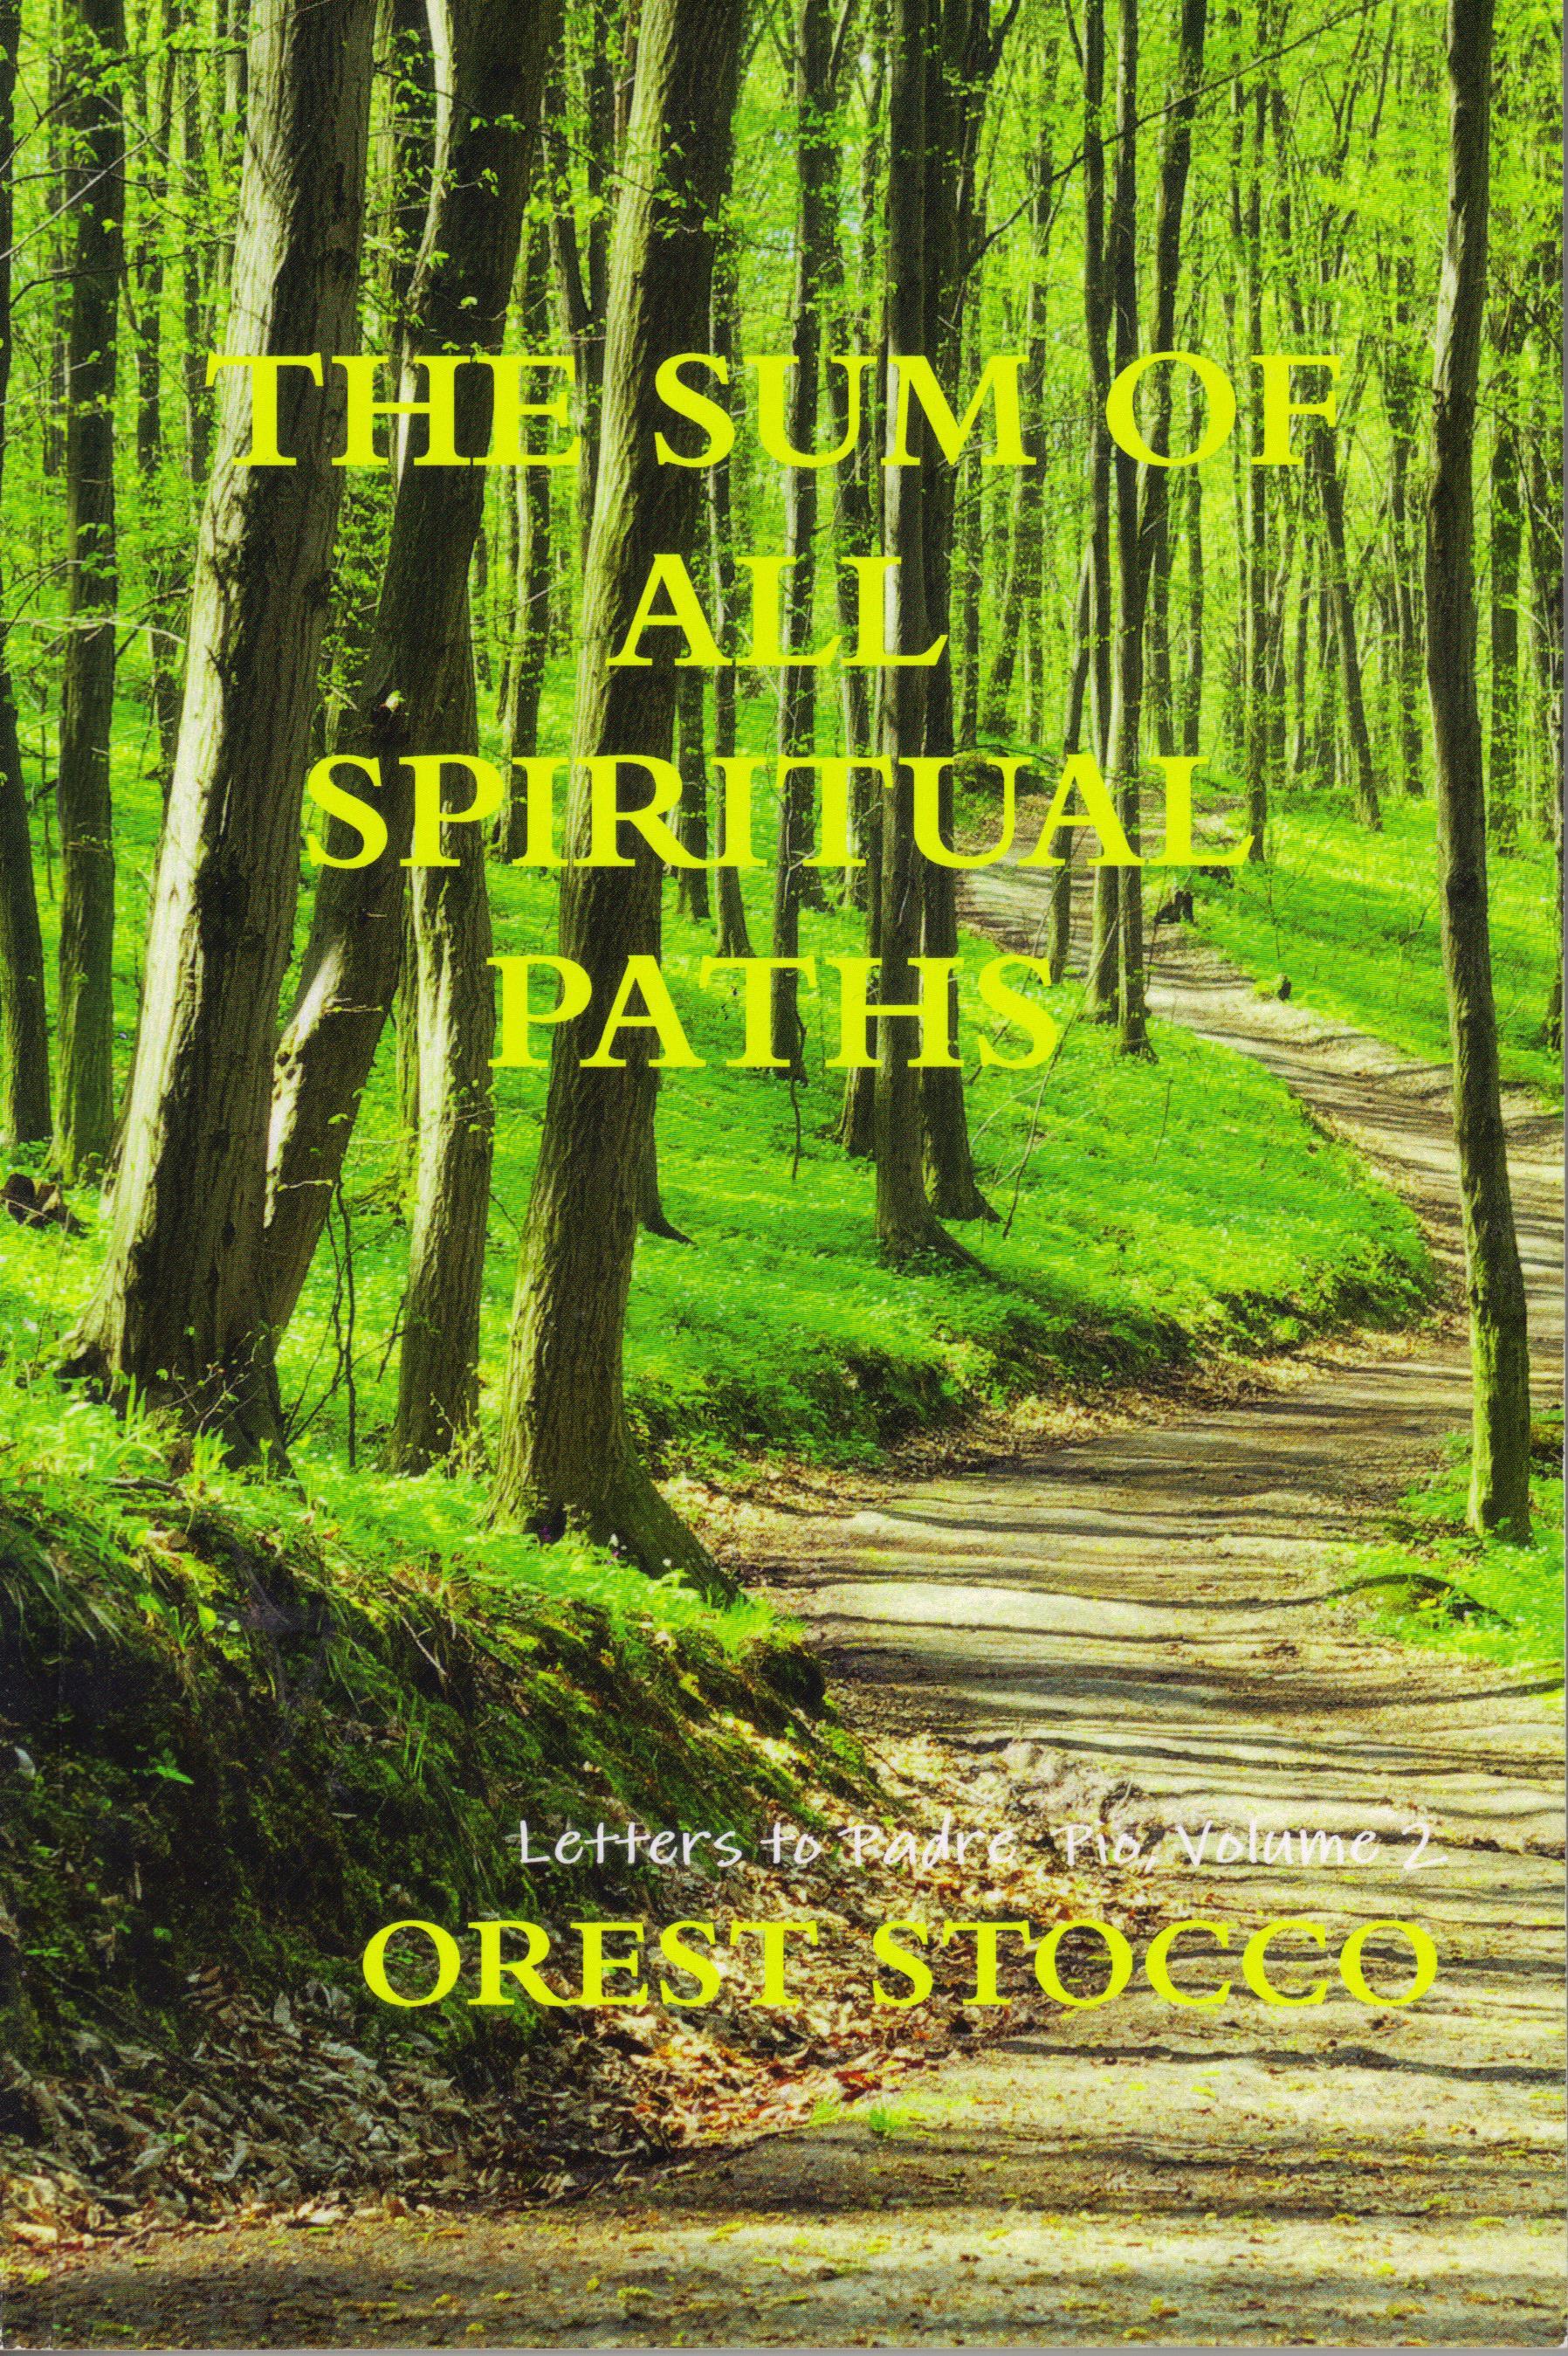 The Sum of All Spiritual Paths